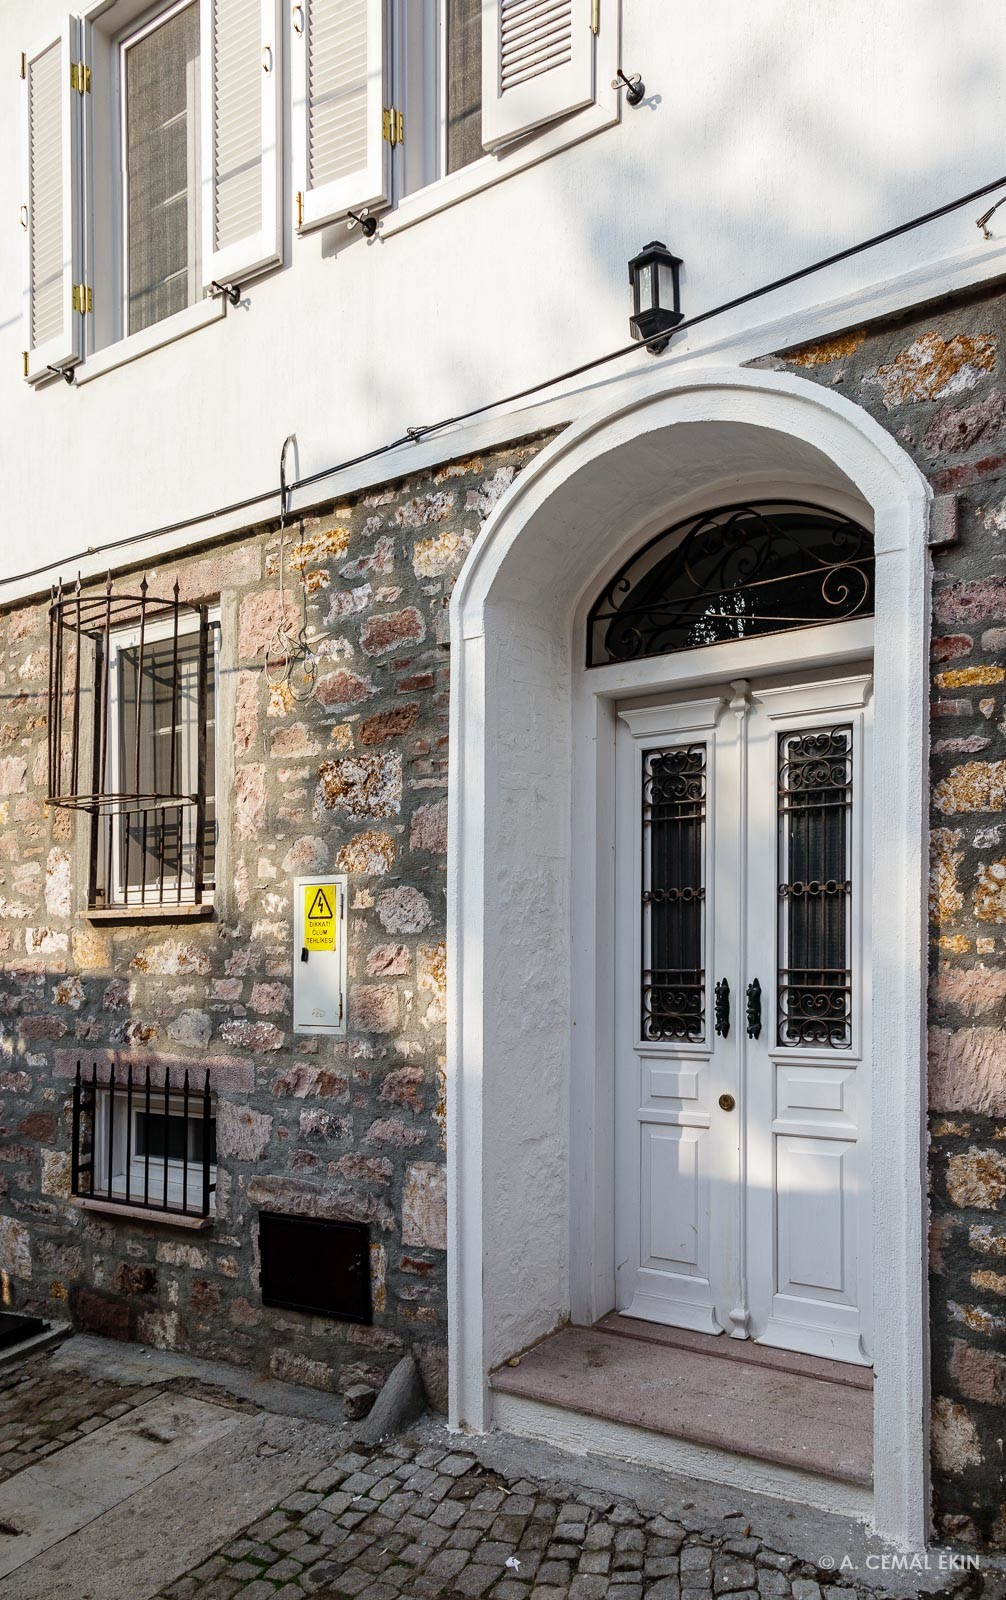 ASKEV Artist Residence